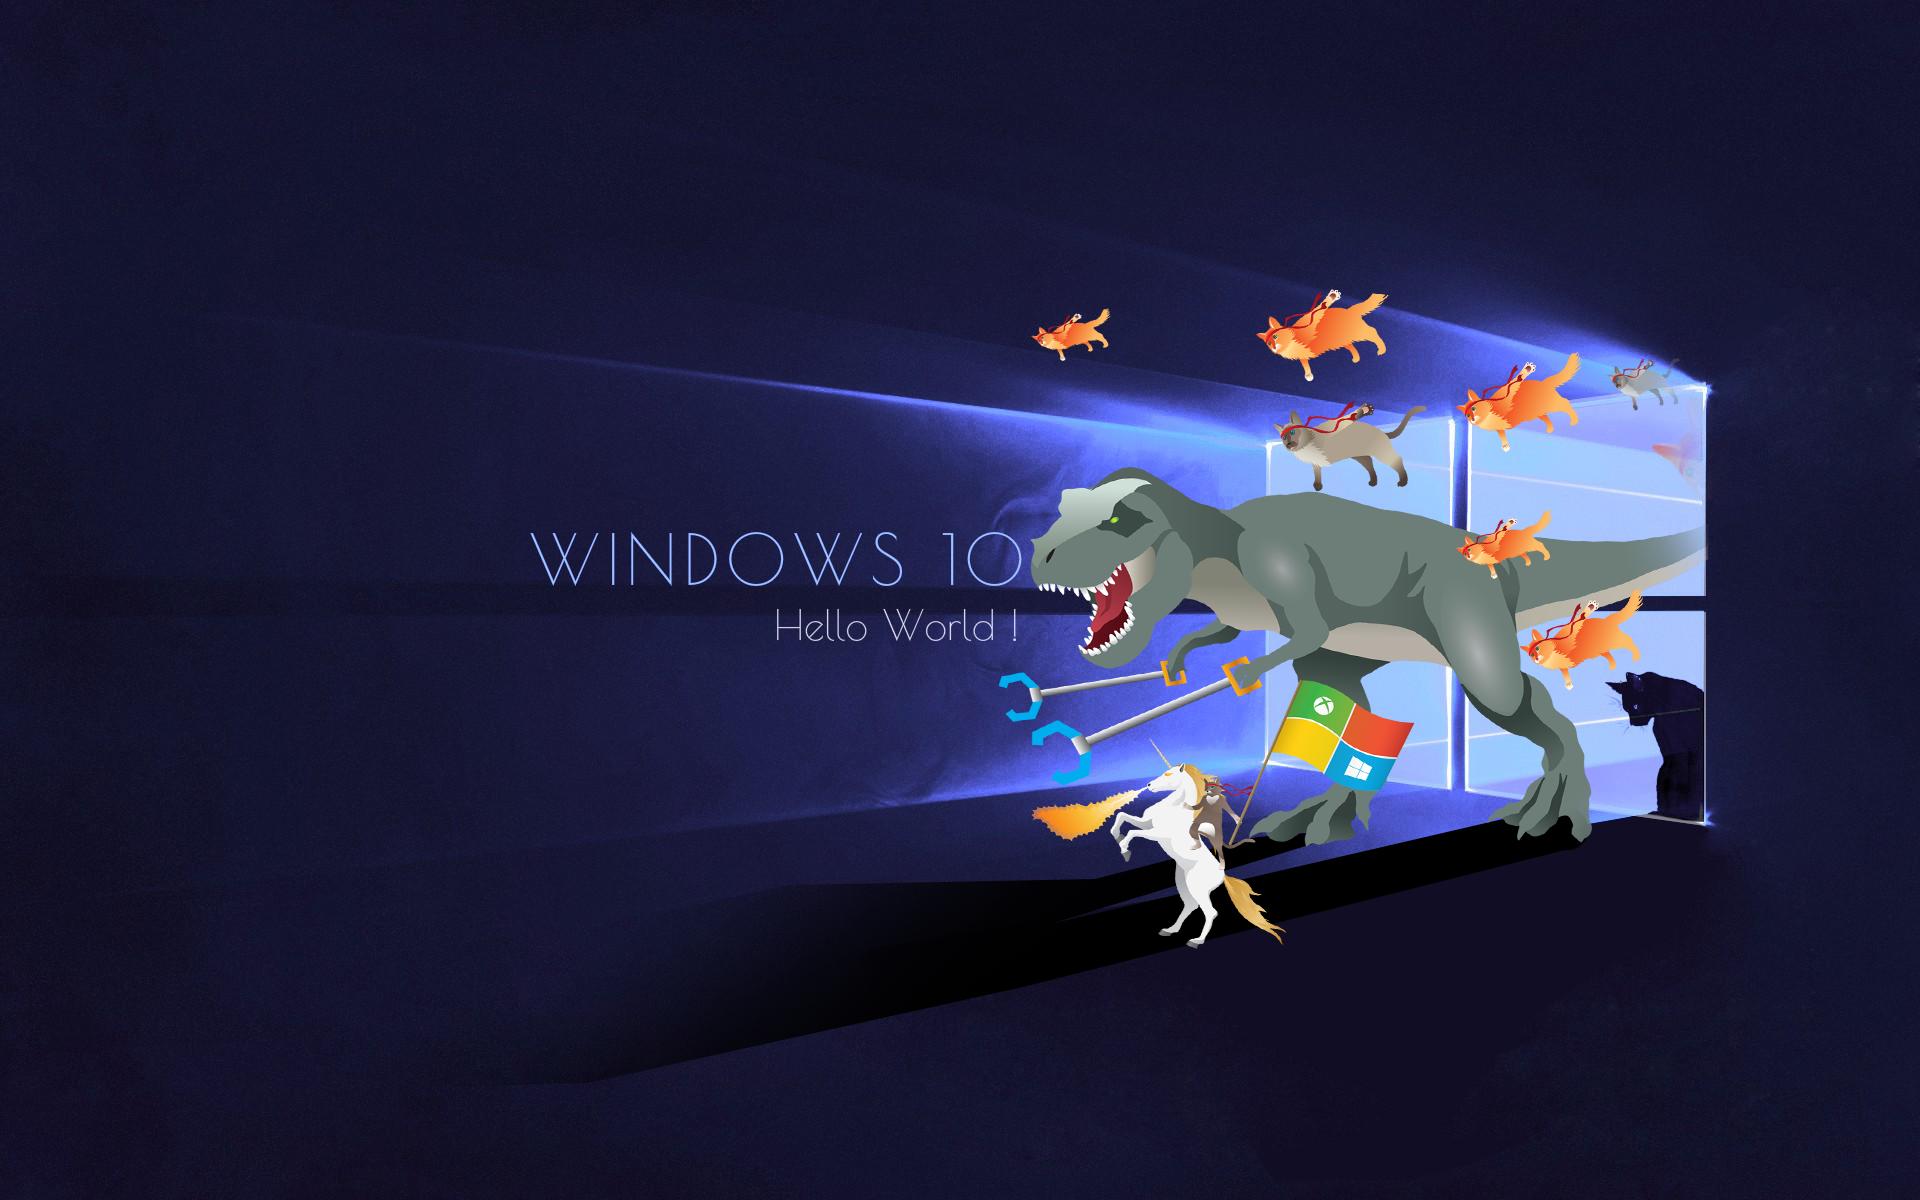 10 Cool Ninja Cat Wallpapers For Microsoft Windows 10 That Will Make 1920x1200